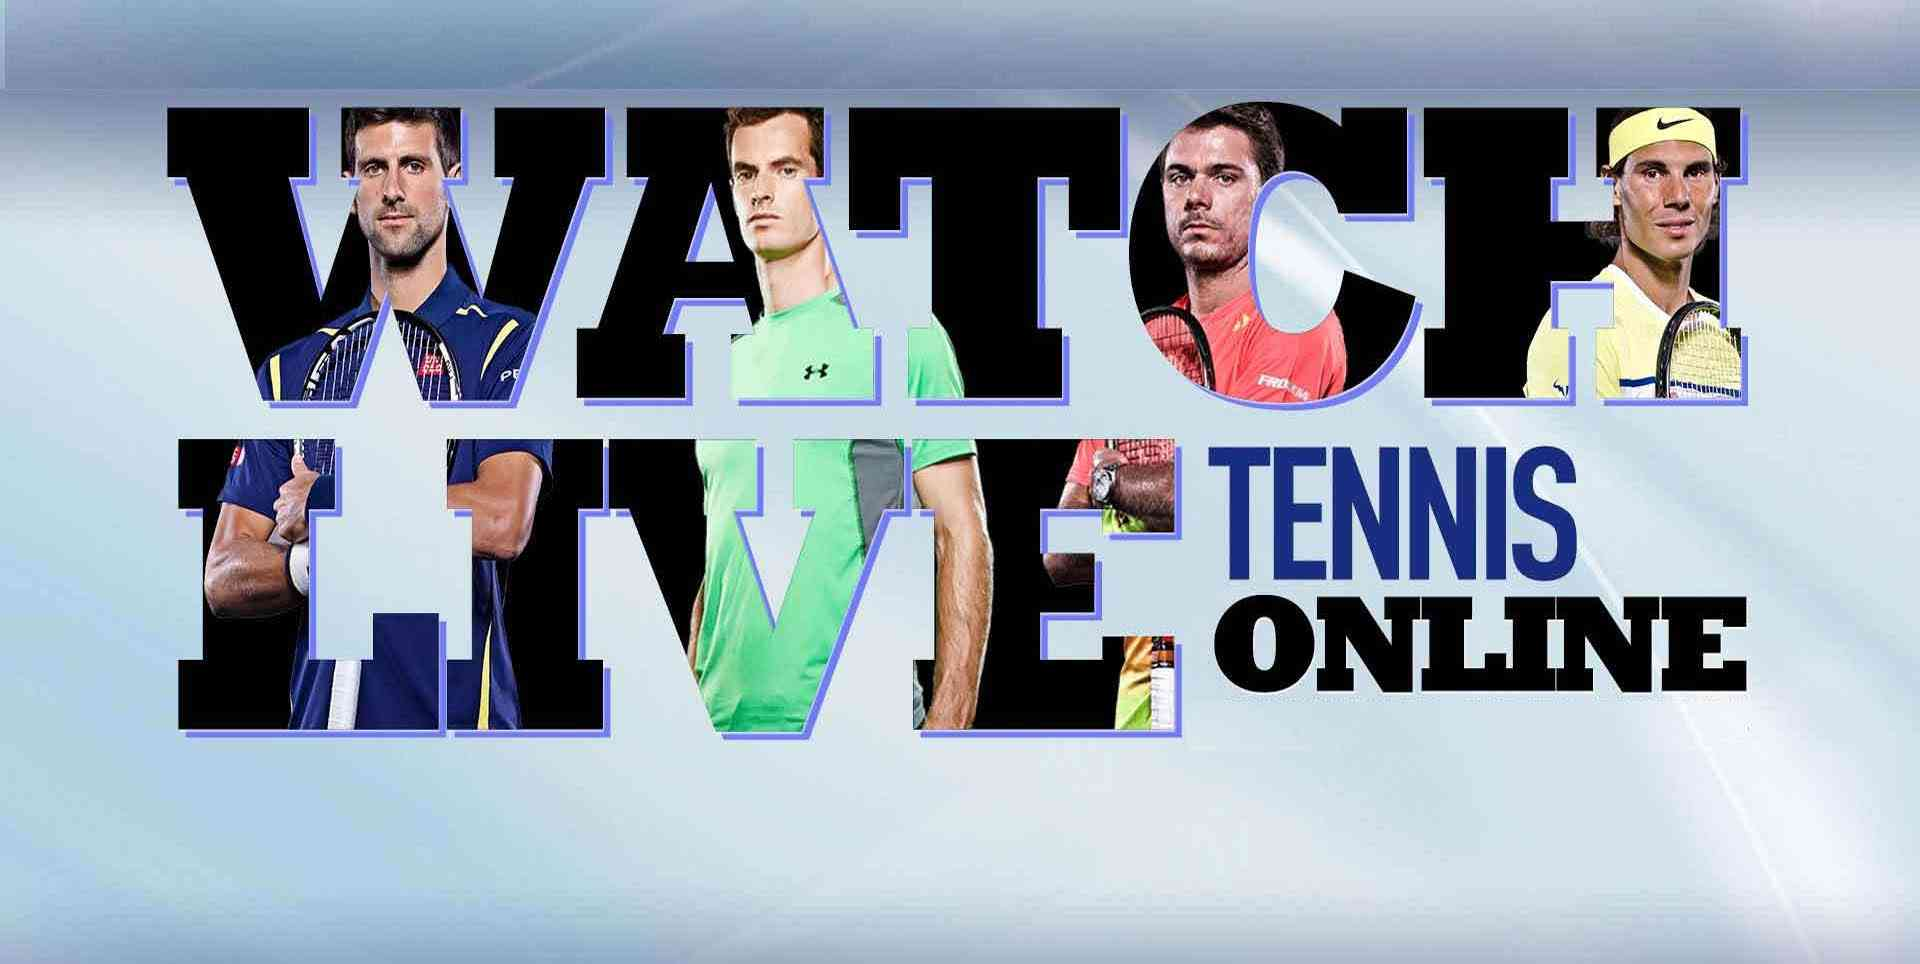 watch-3rd-round-s.-wawrinka-vs-d.-istomin-online